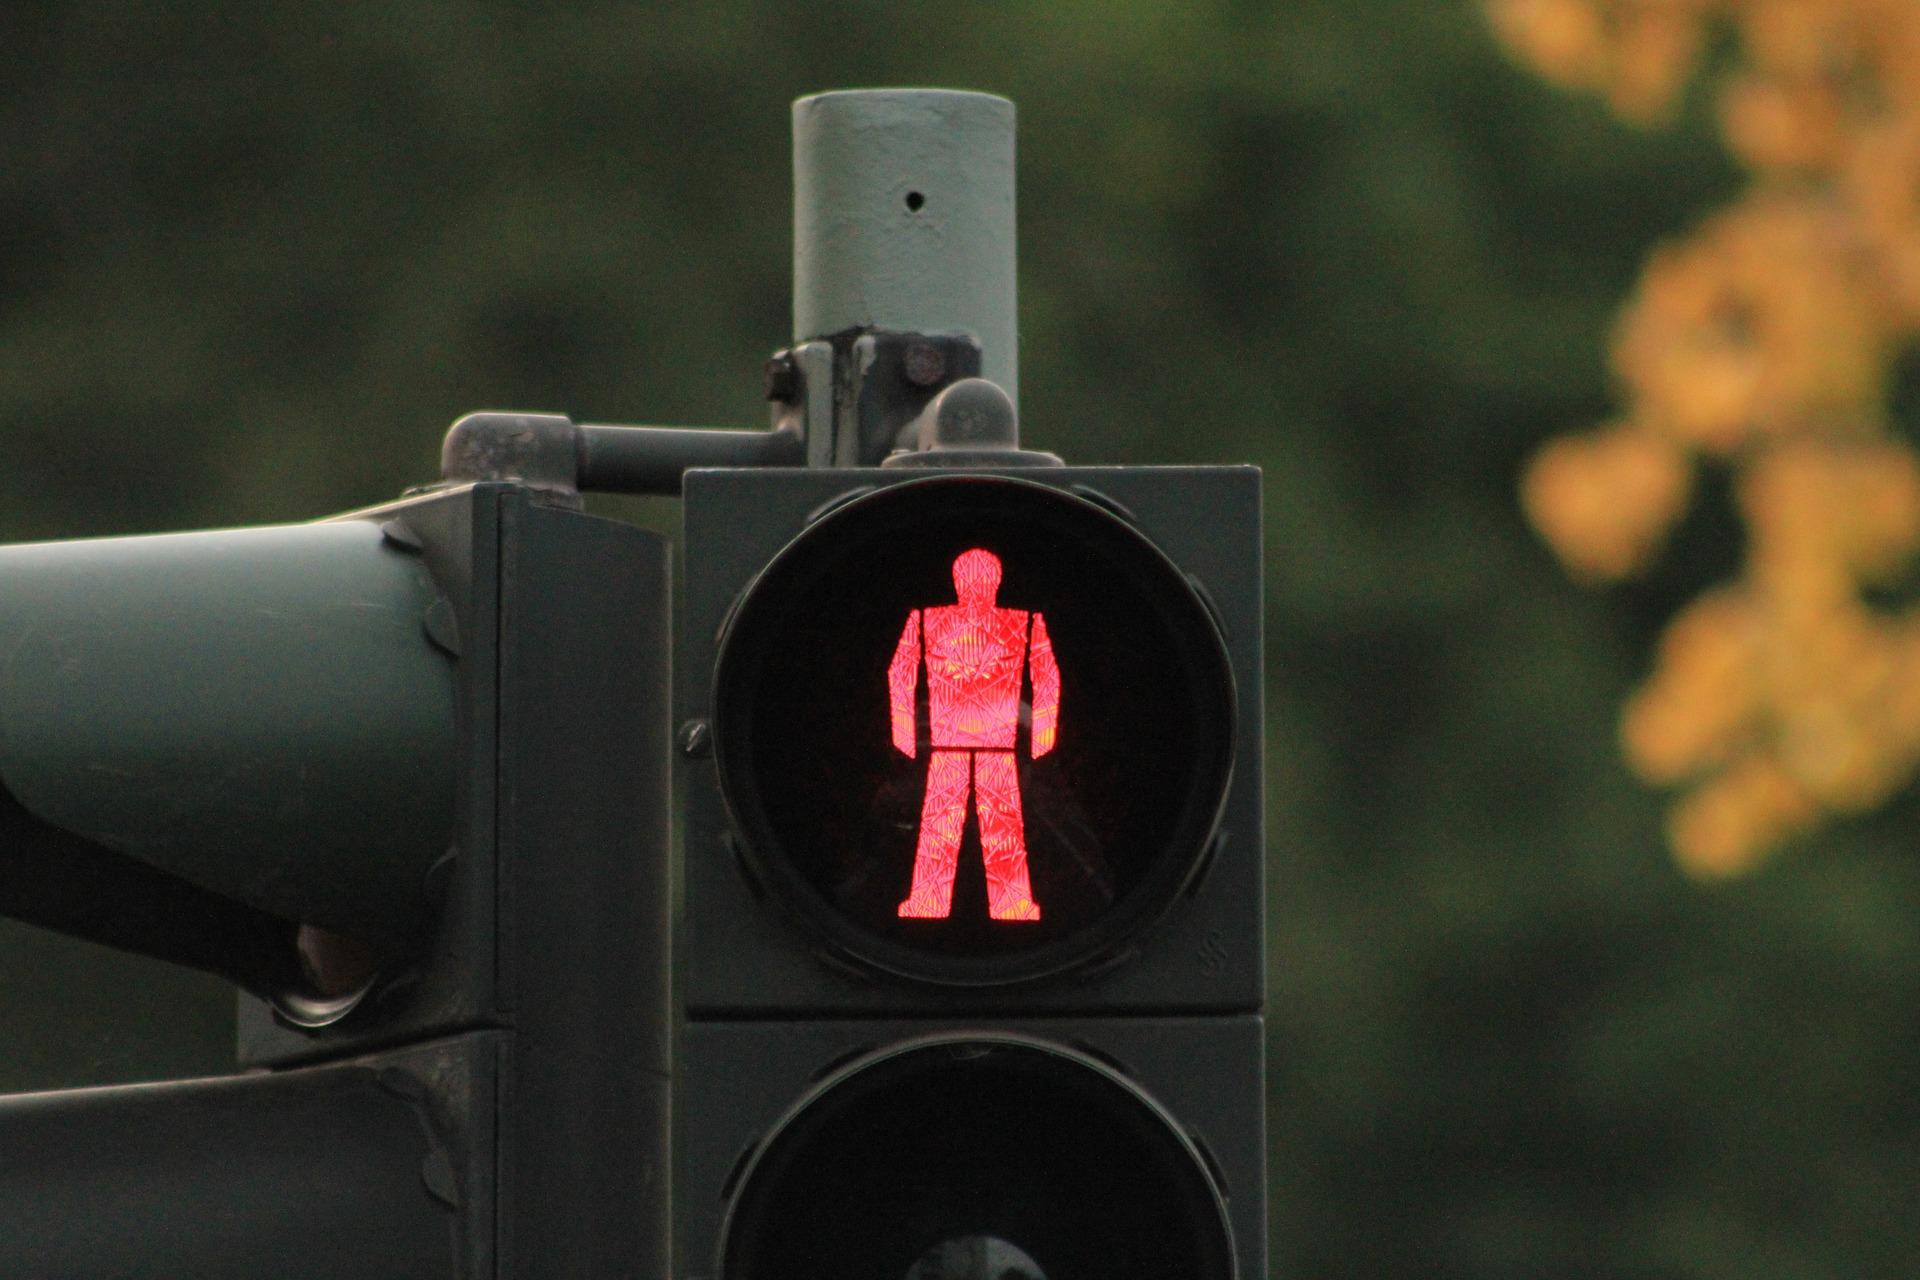 Kinder im Auto rote Ampel